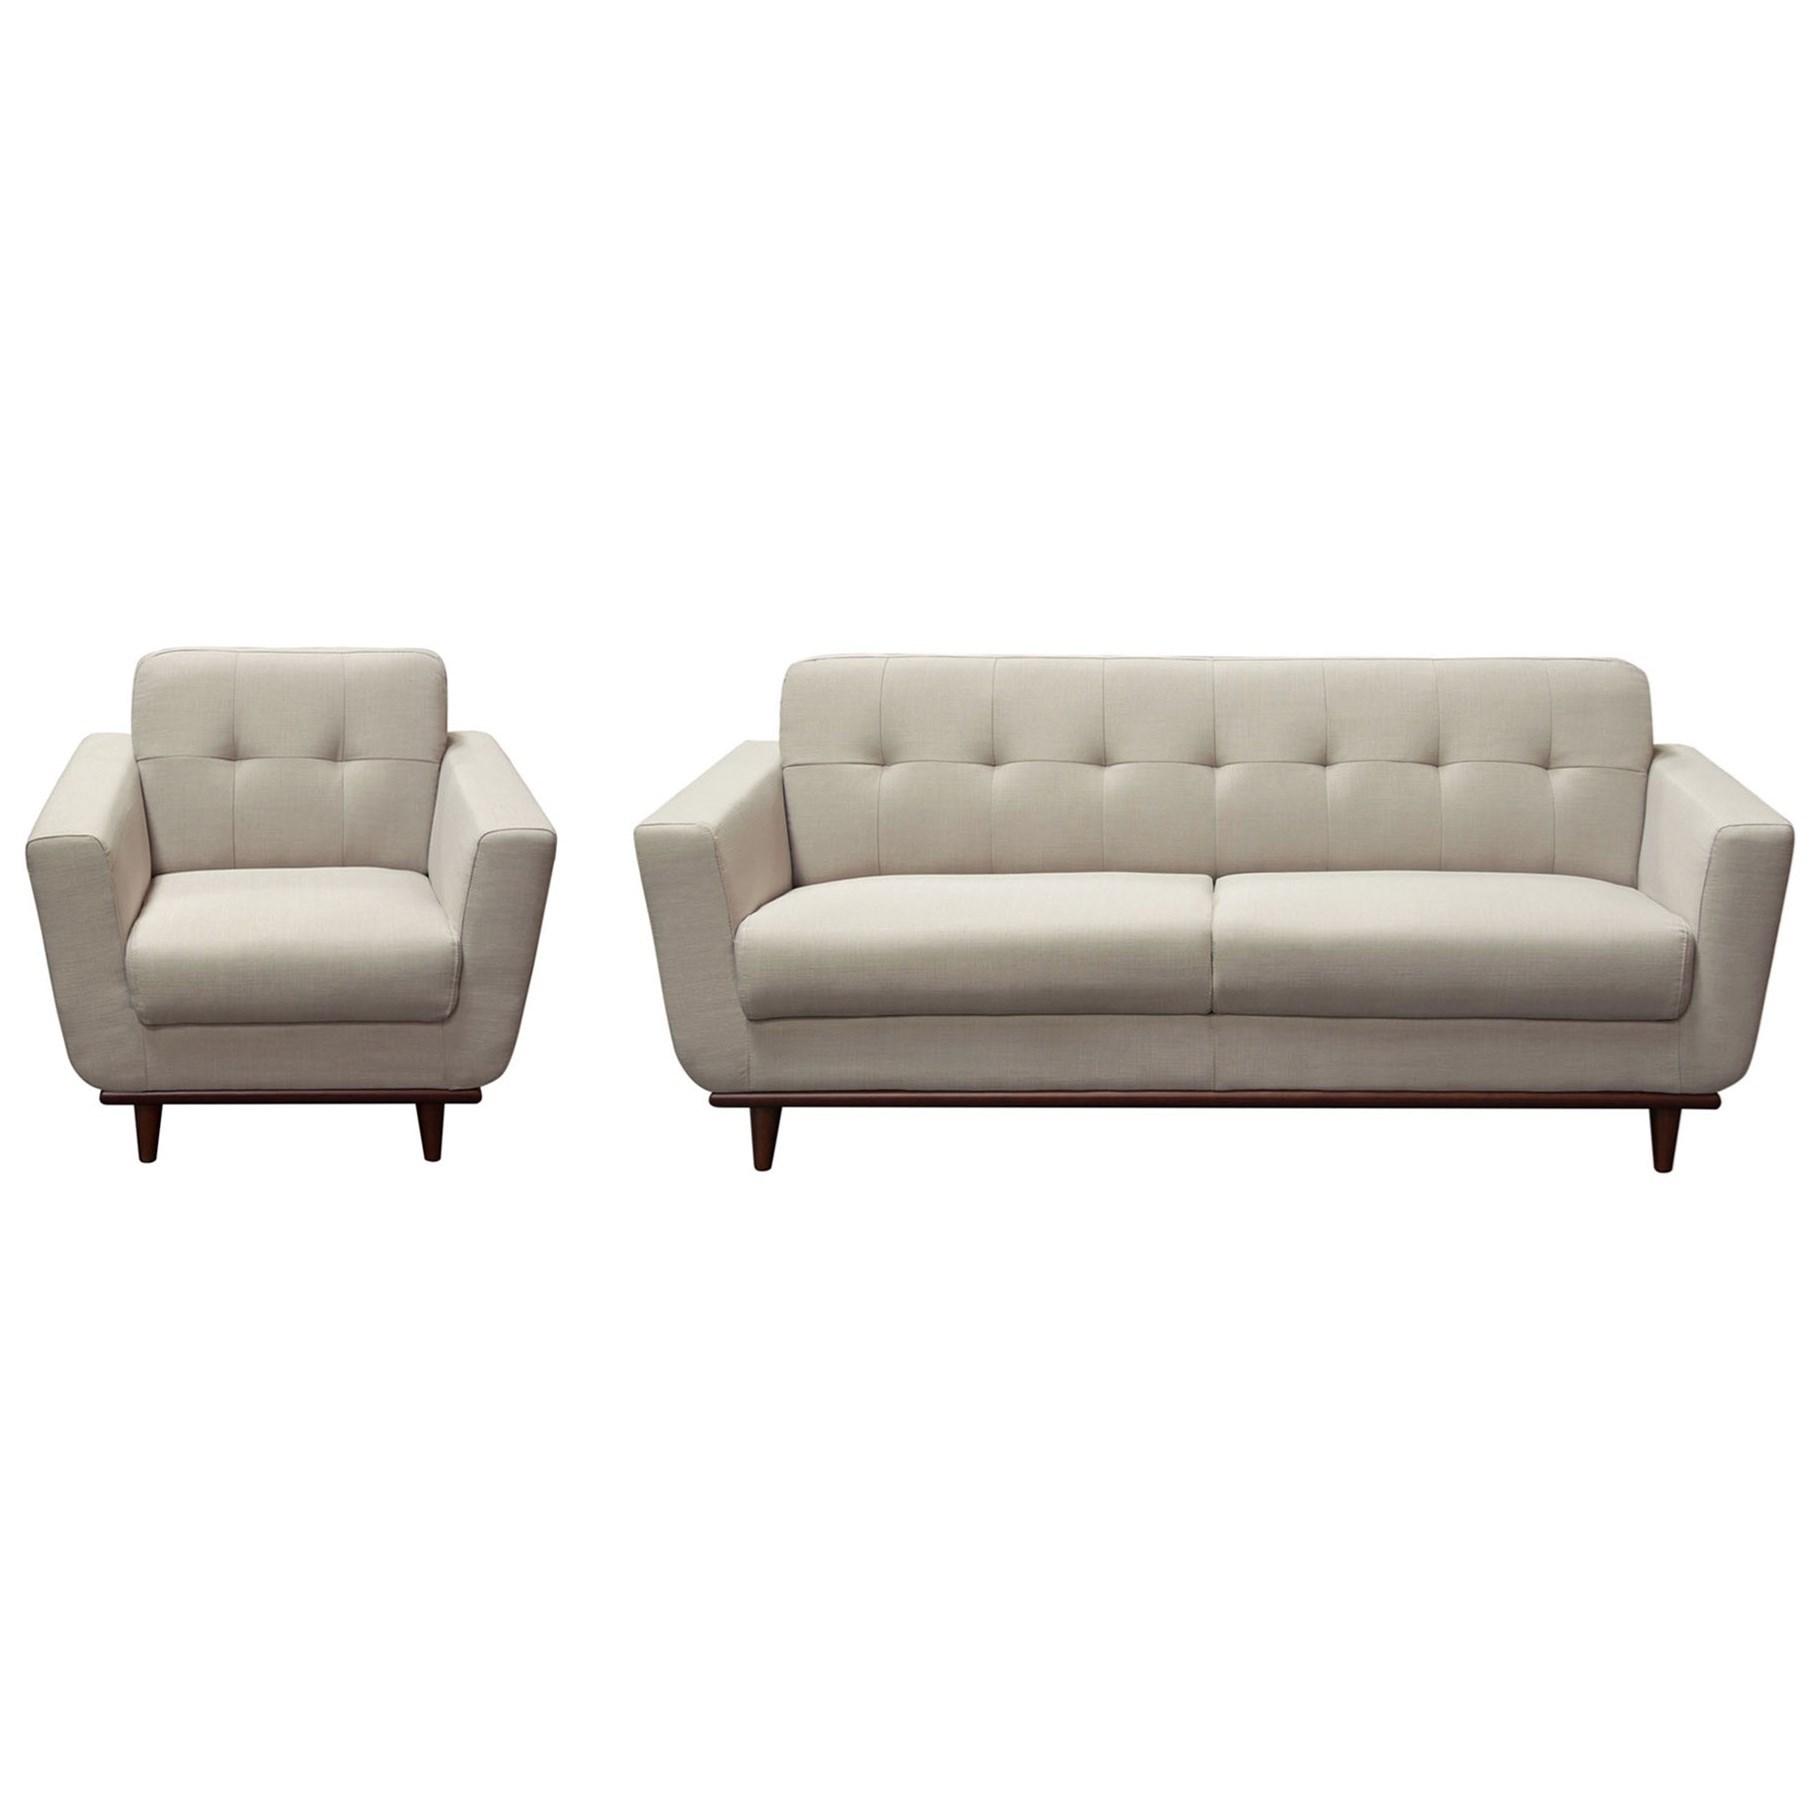 Diamond Sofa Coco Mid Century Modern Sofa and Chair Set with